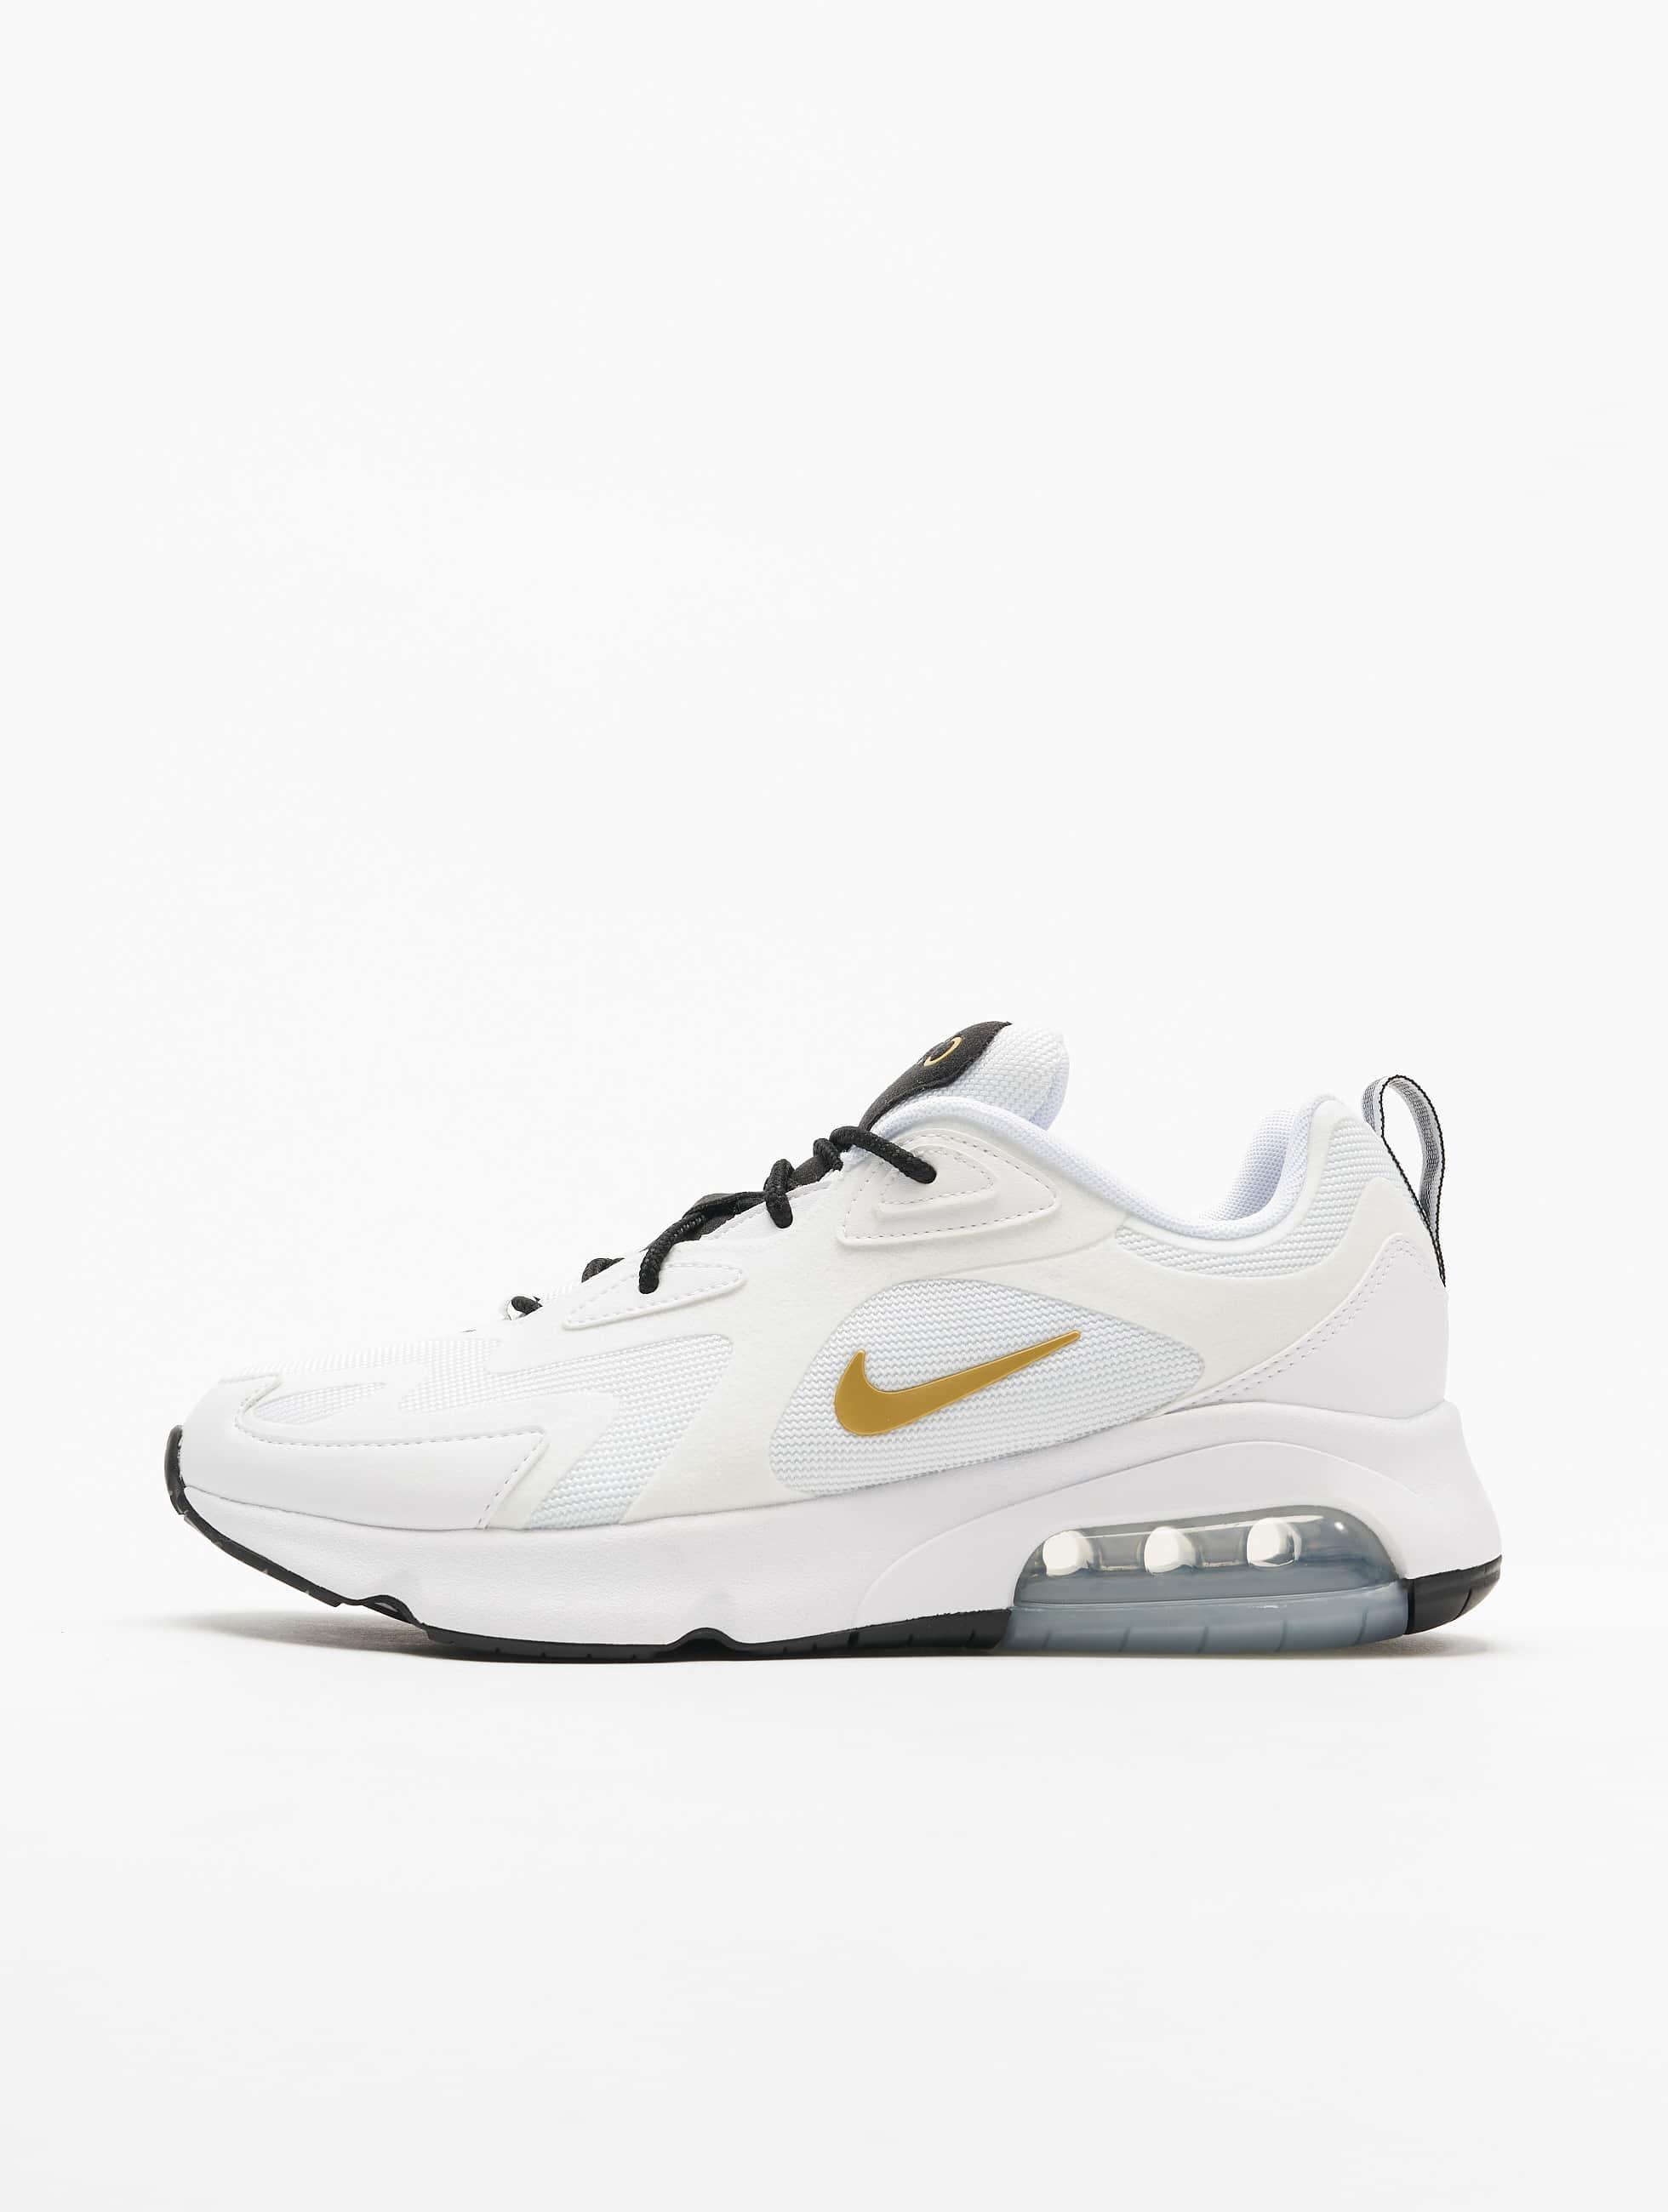 Nike Air Max 200 Sneakers White/Metallic Golden/Black